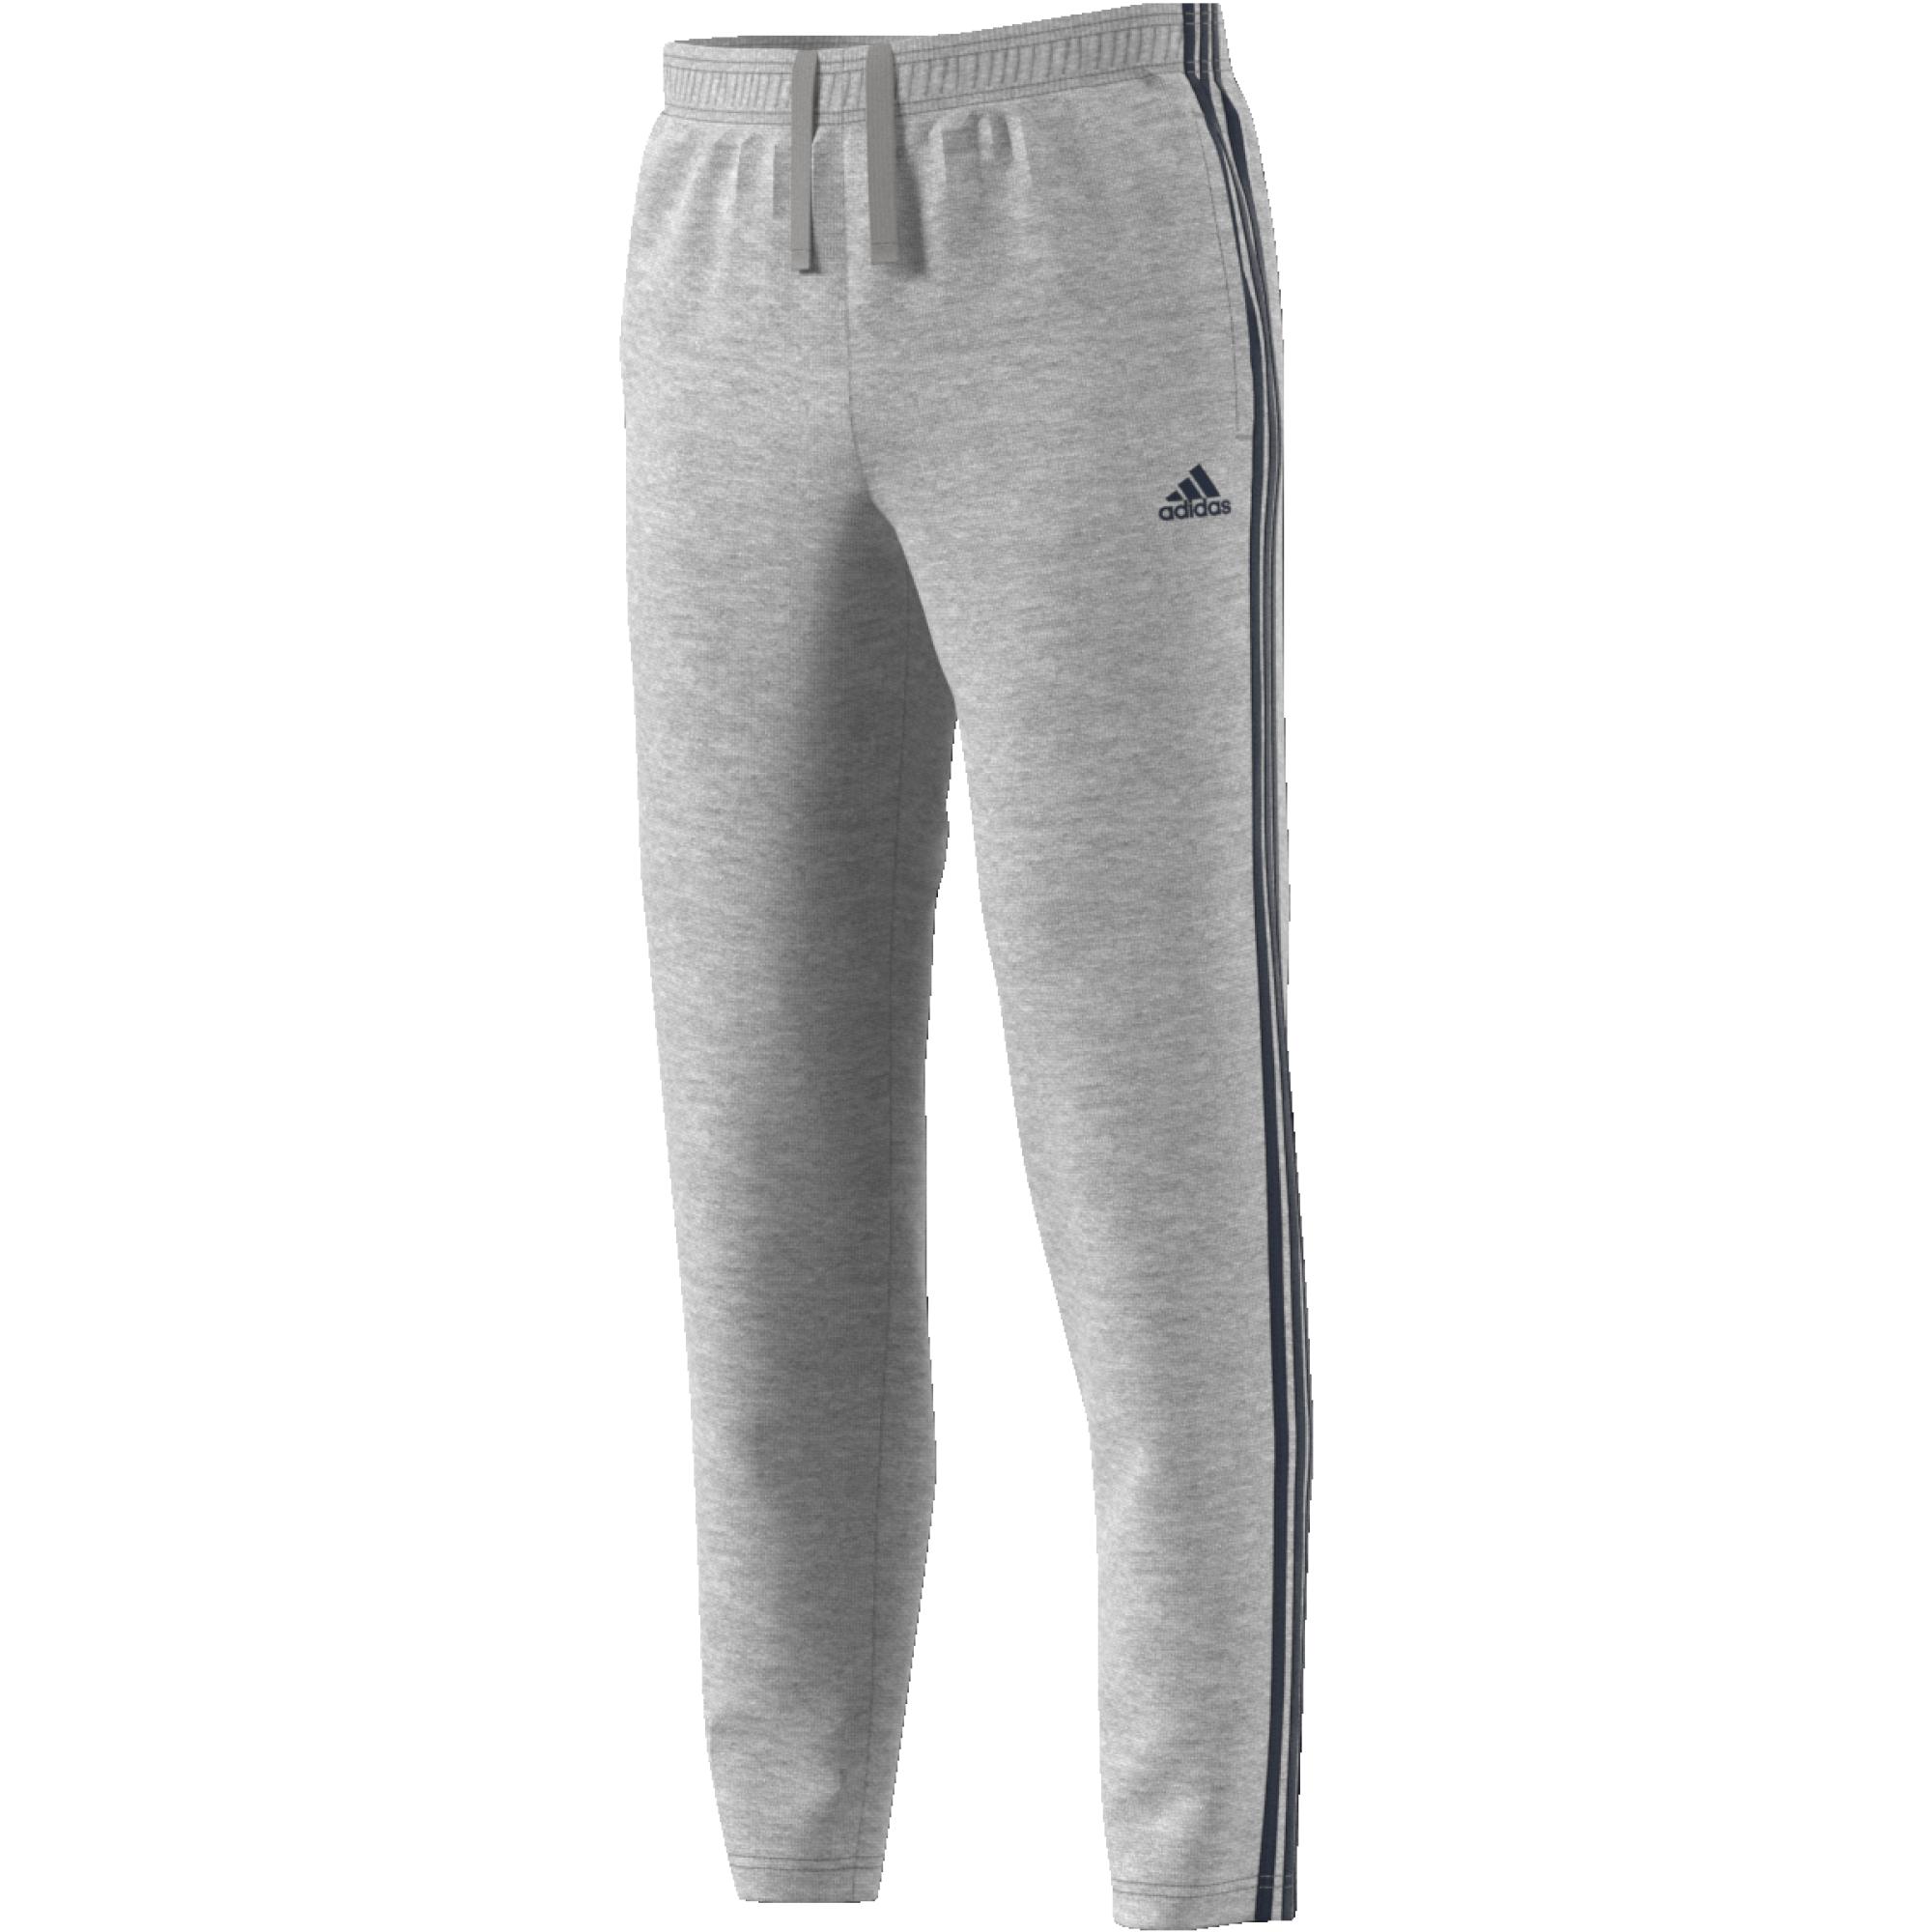 932c6ba268 Adidas alsó , Férfi ruházat   nadrág , adidas_performance , Adidas alsó